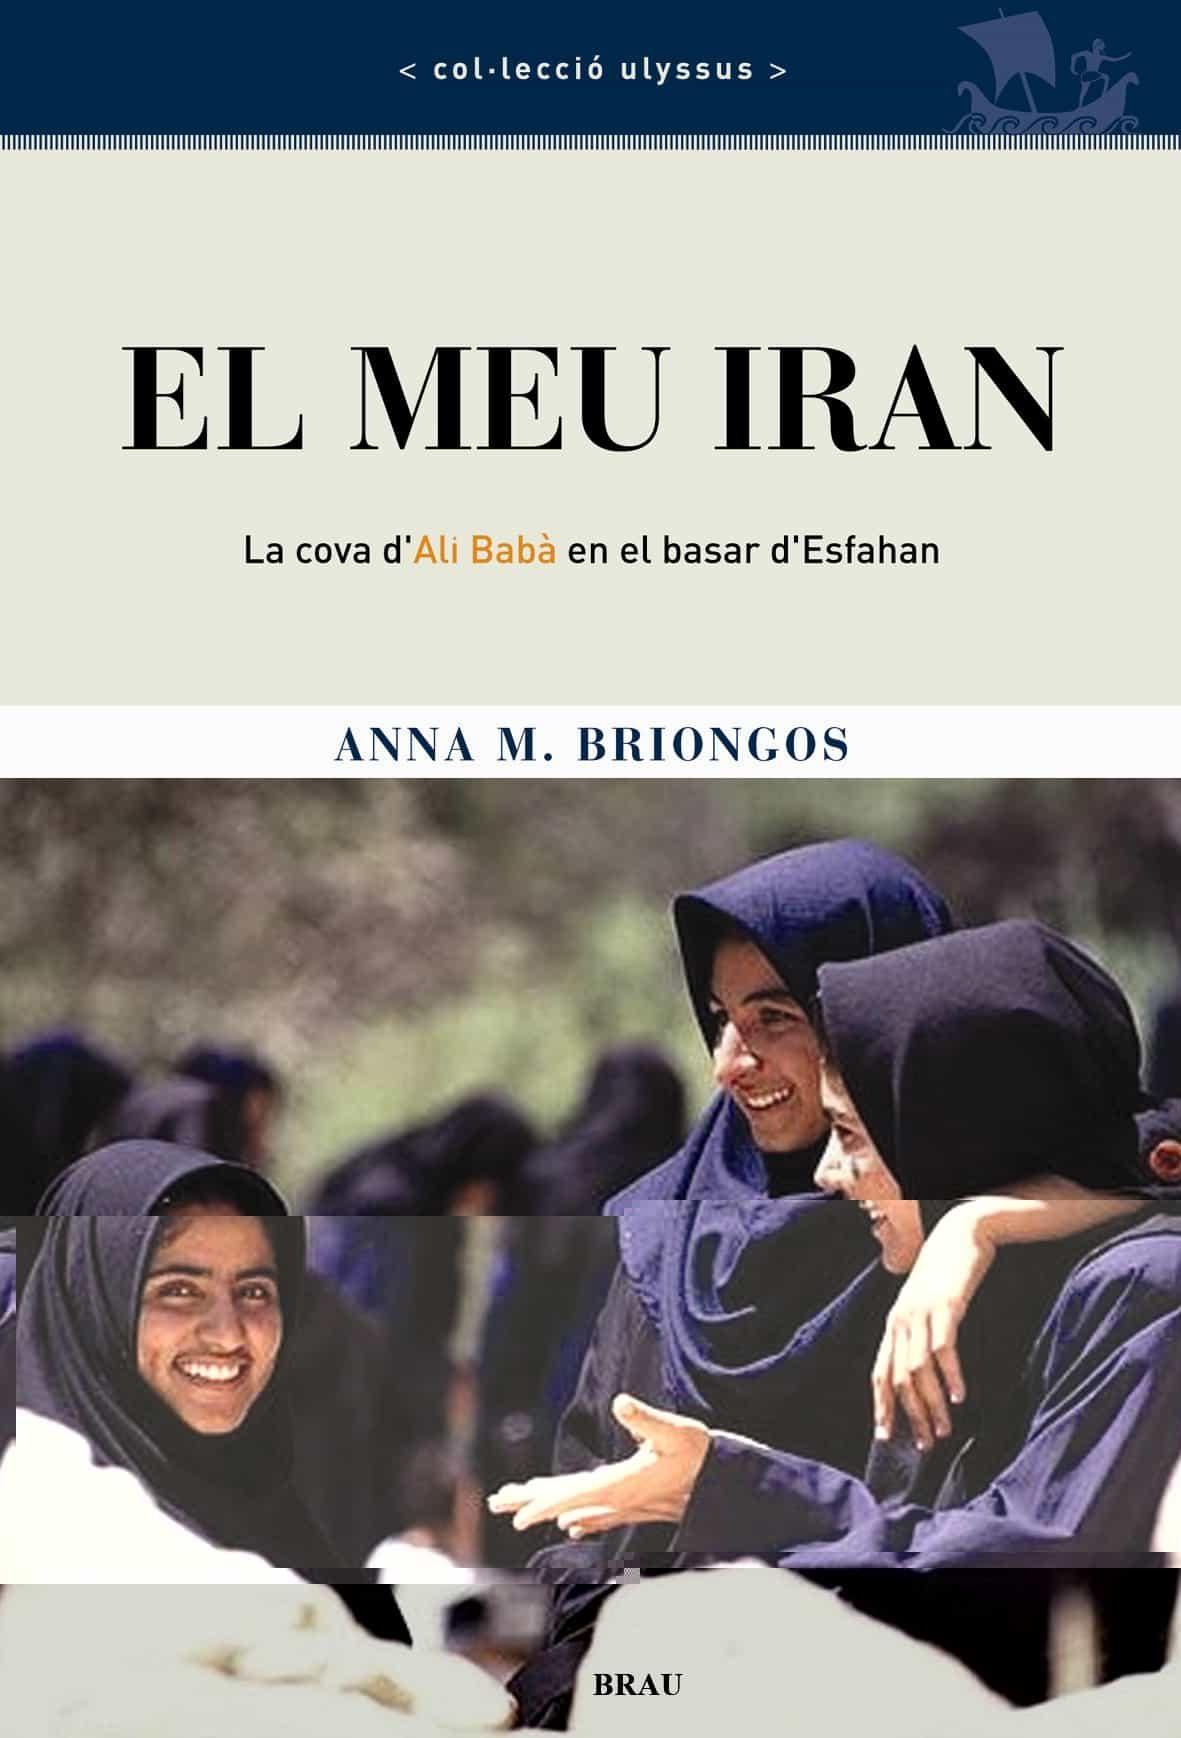 El Meu Iran por Ana M. Briongos epub